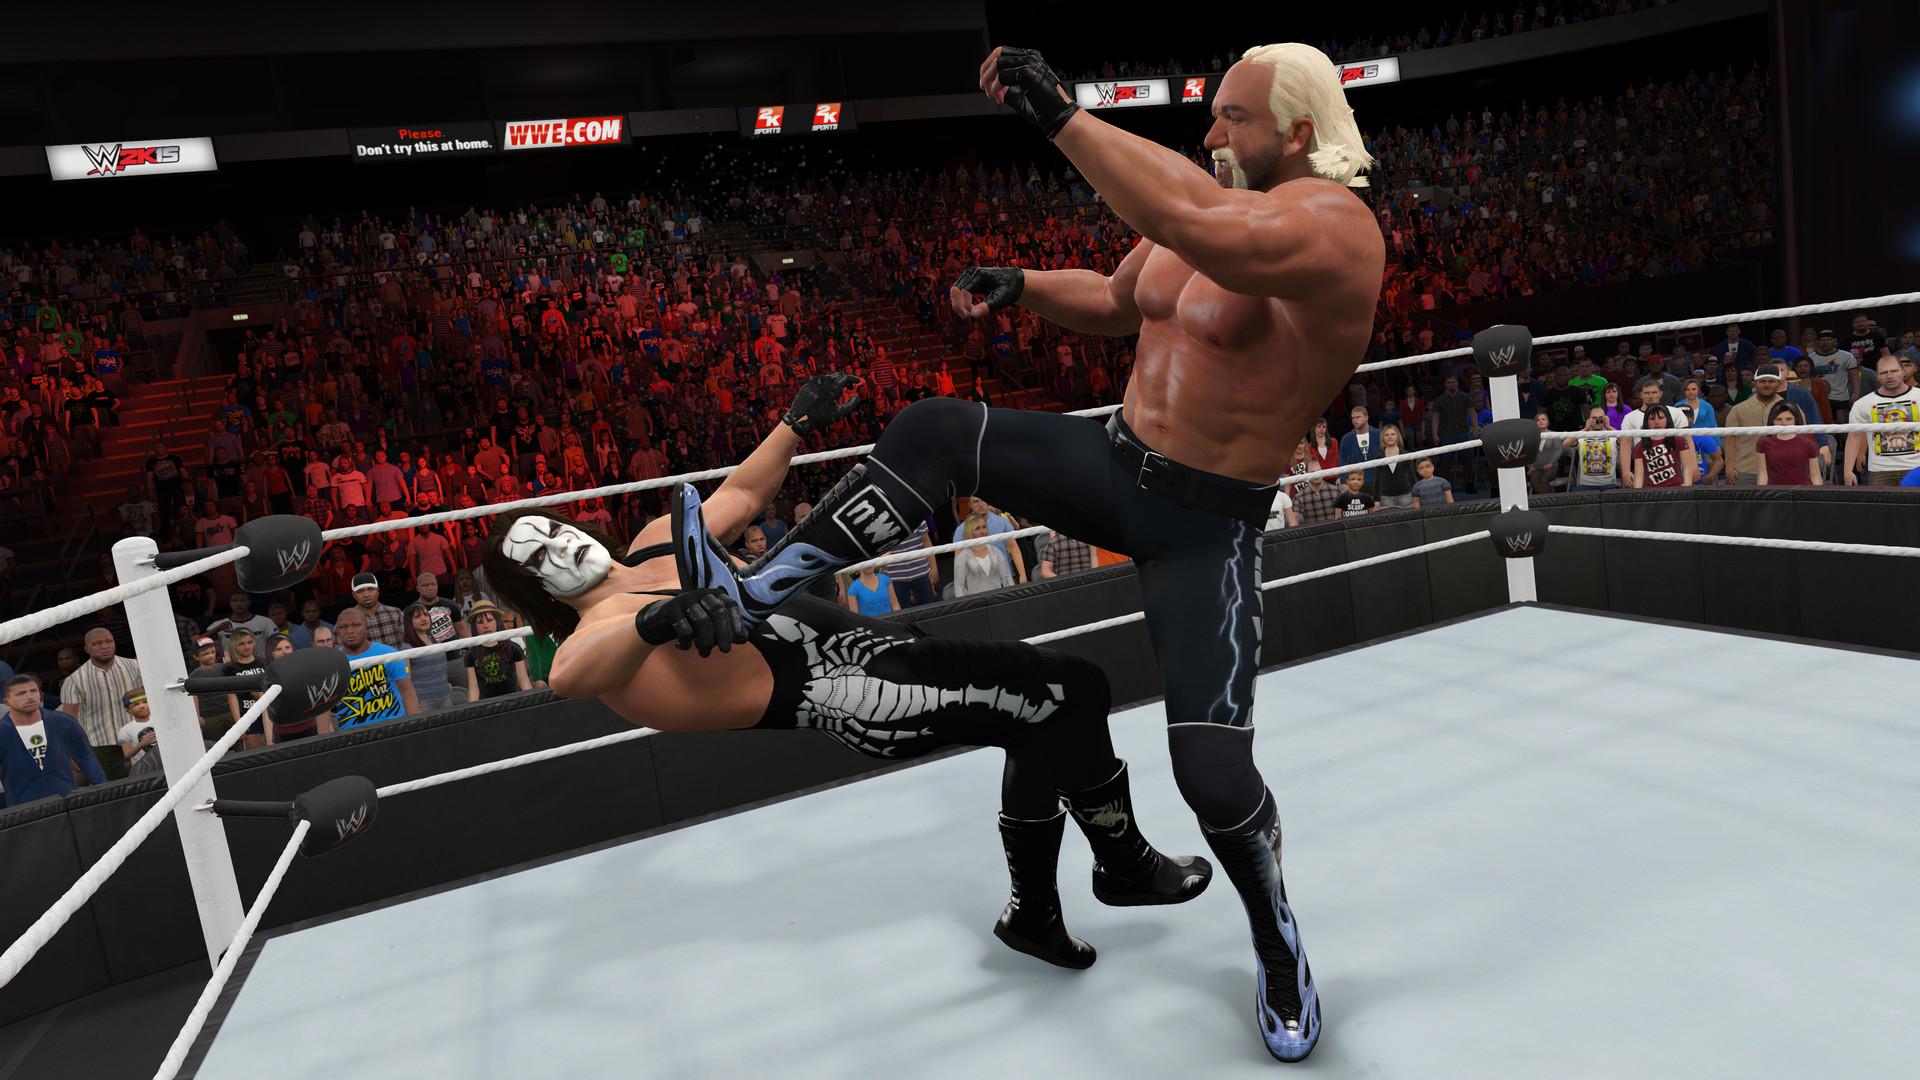 WWE 2K15 ESPAÑOL Full PC + DLC Pack Addon (RELOADED) + REPACK 5 DVD5 (JPW) 4